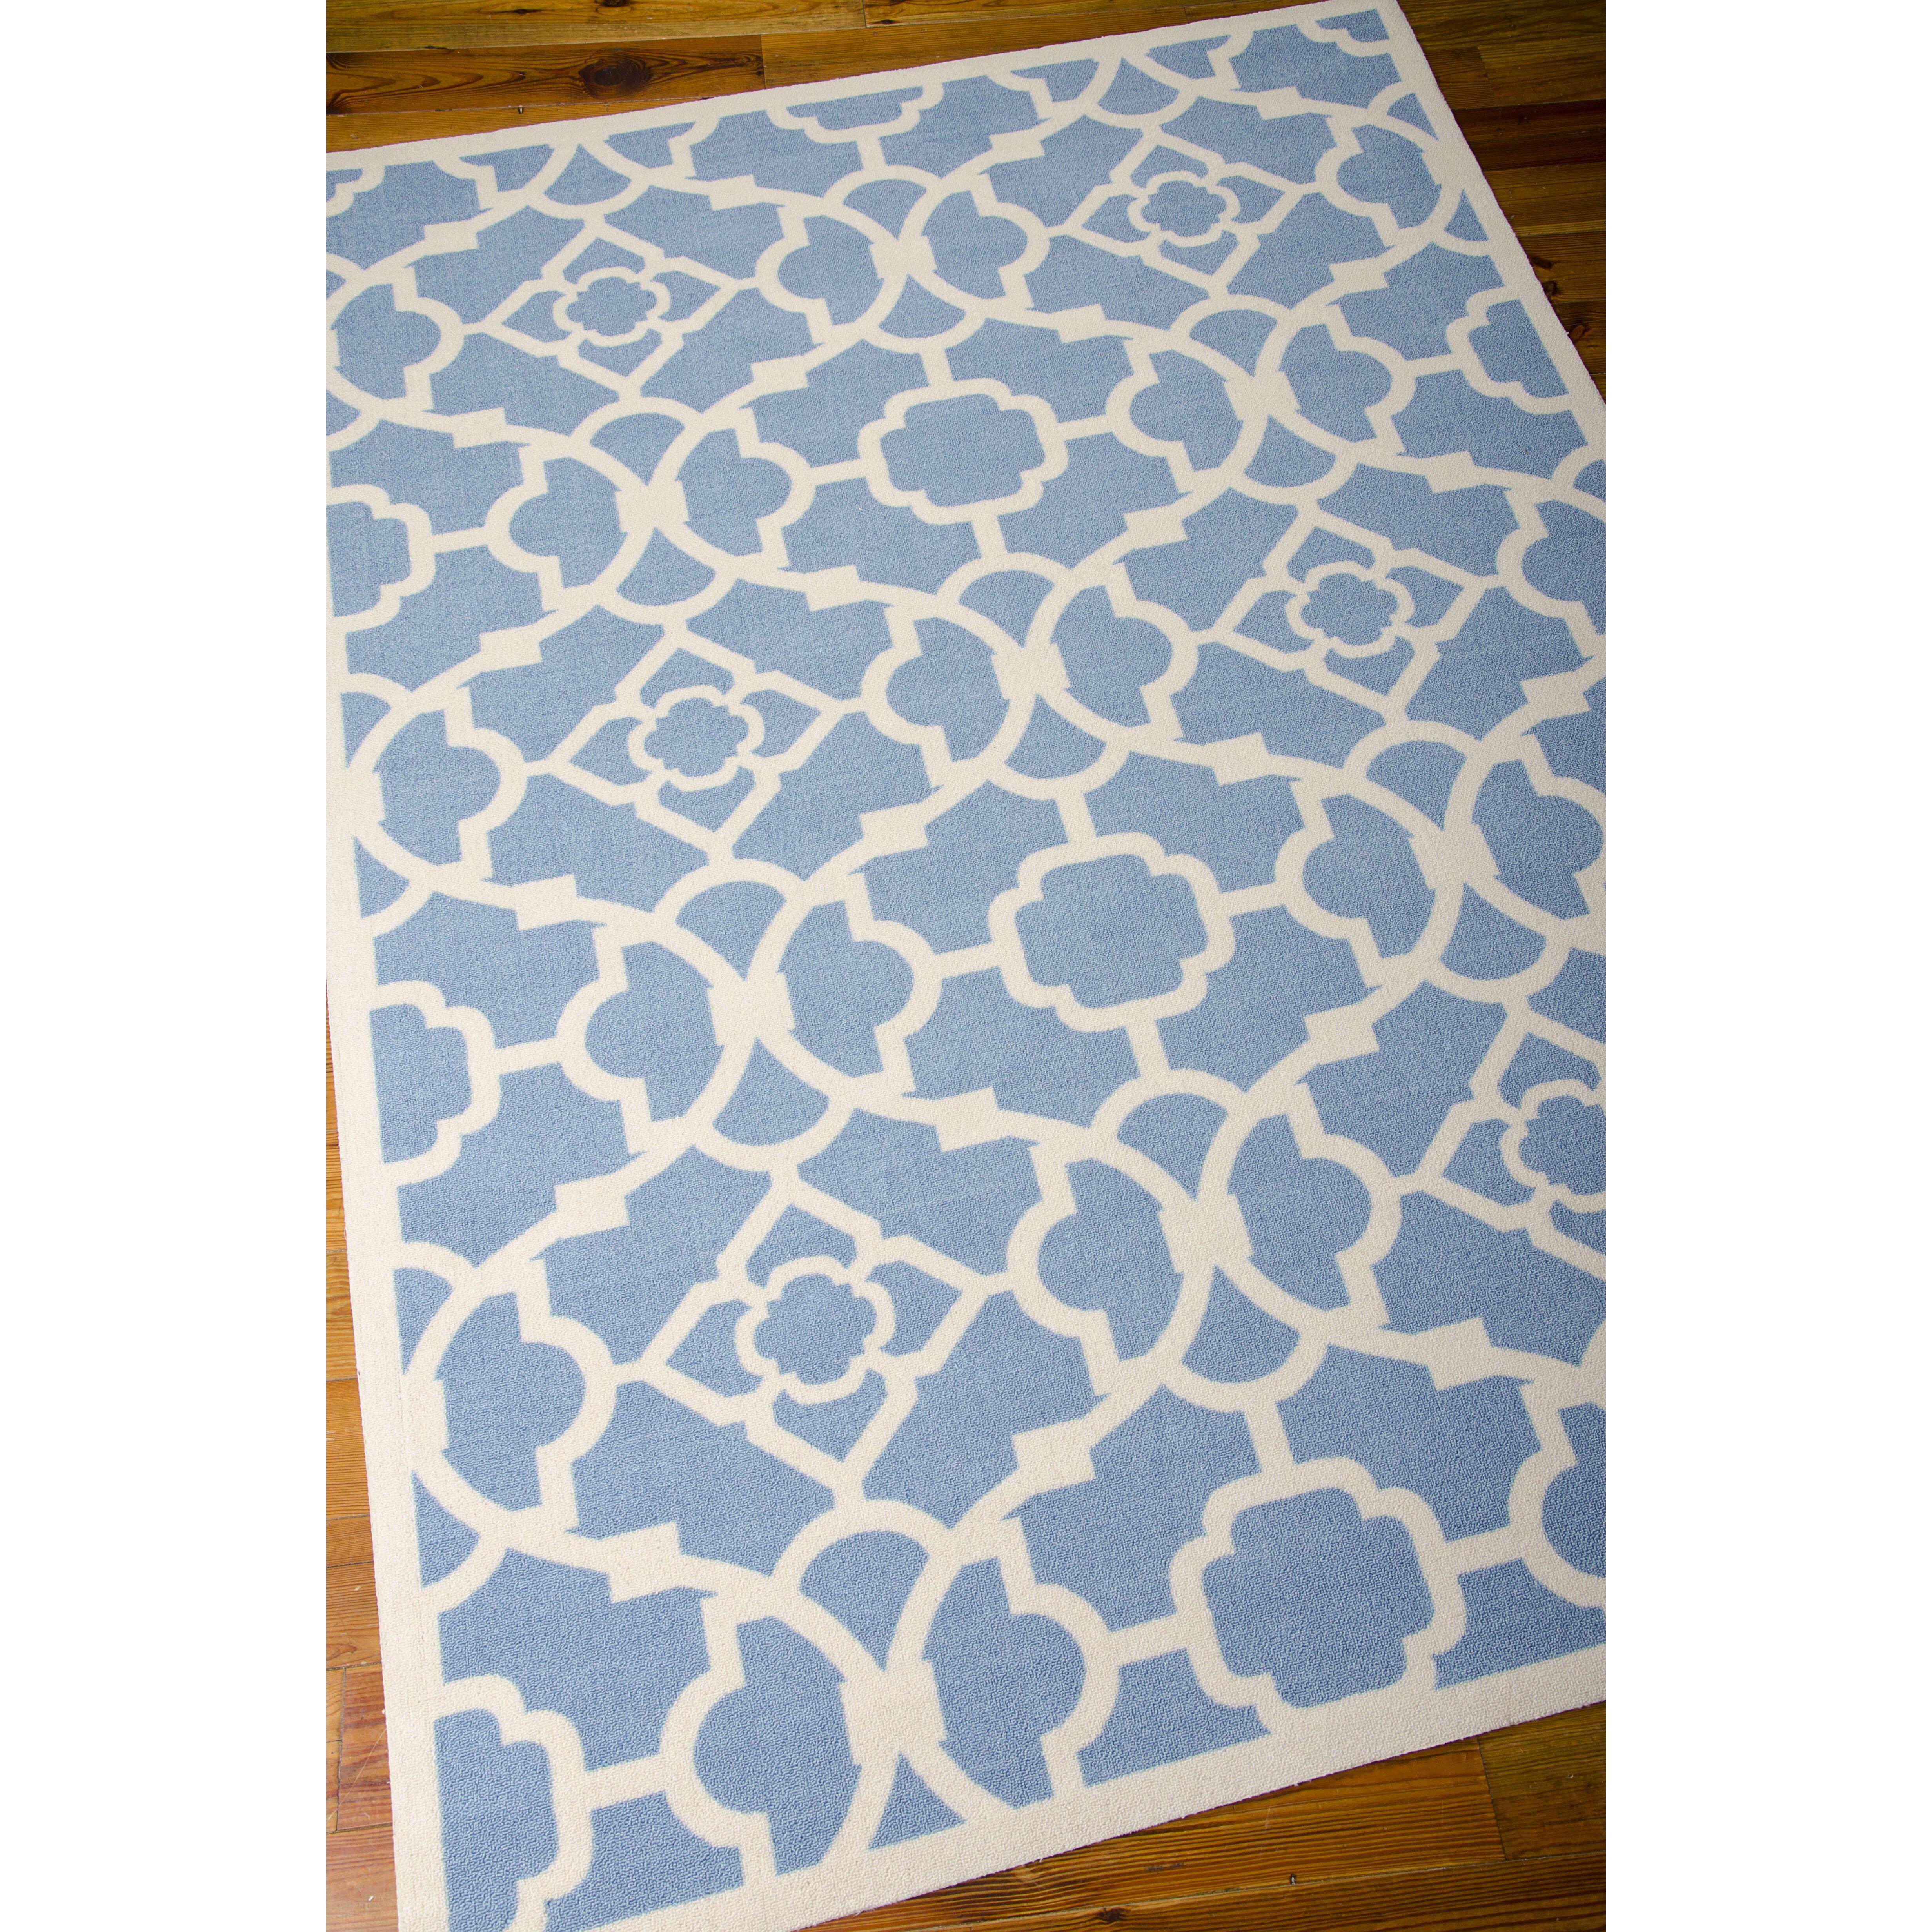 alcott hill kenton indoor outdoor blue white area rug. Black Bedroom Furniture Sets. Home Design Ideas